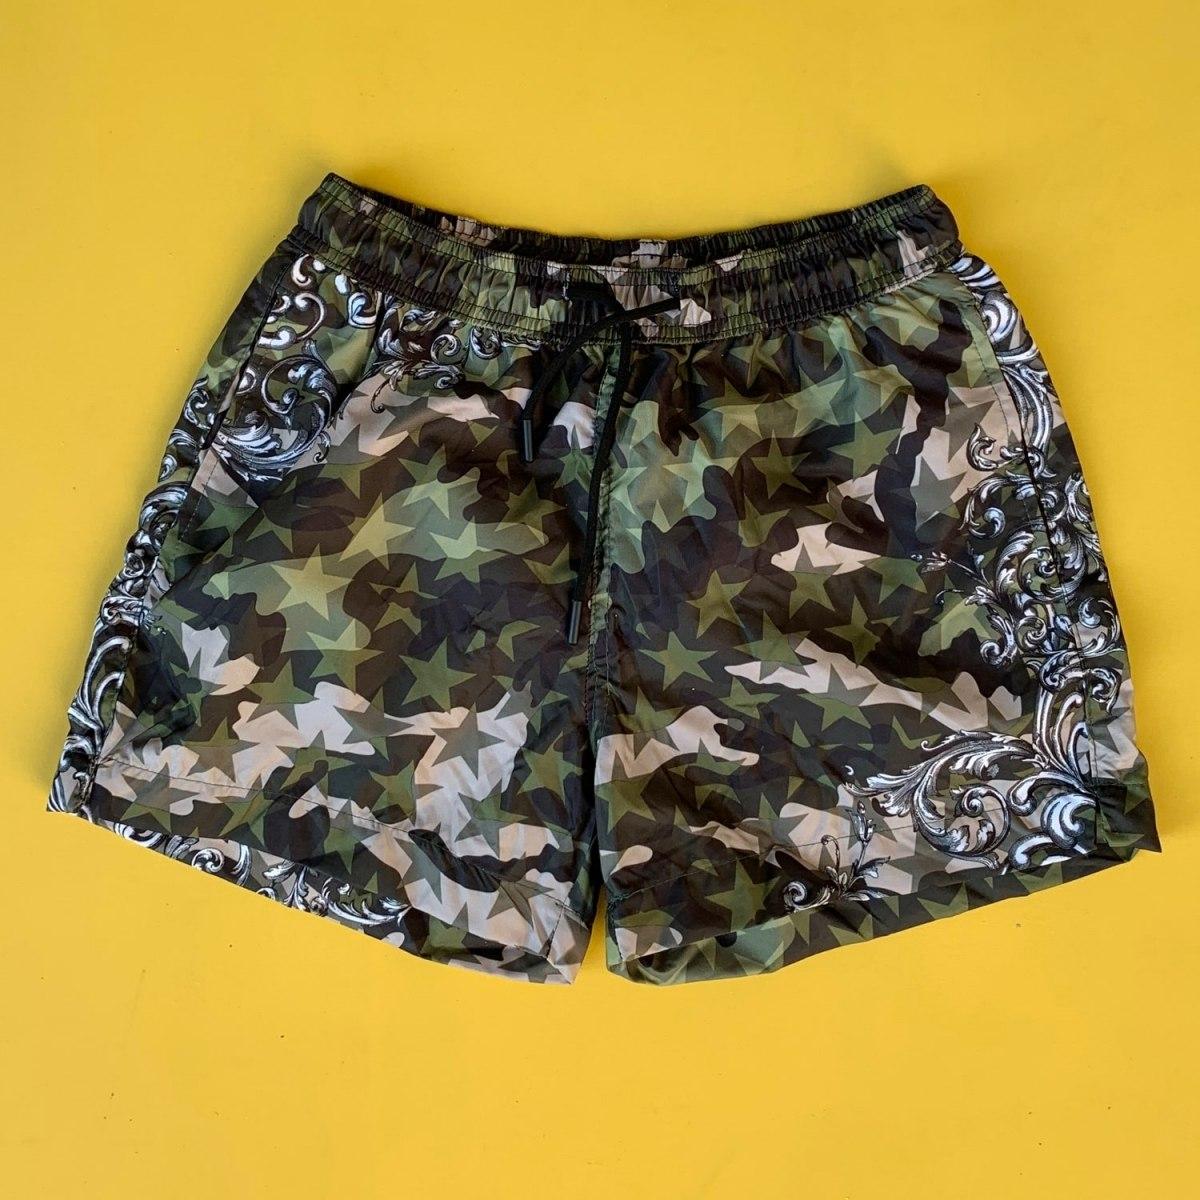 Men's Star Patterned Camouflage Short Swim Shorts